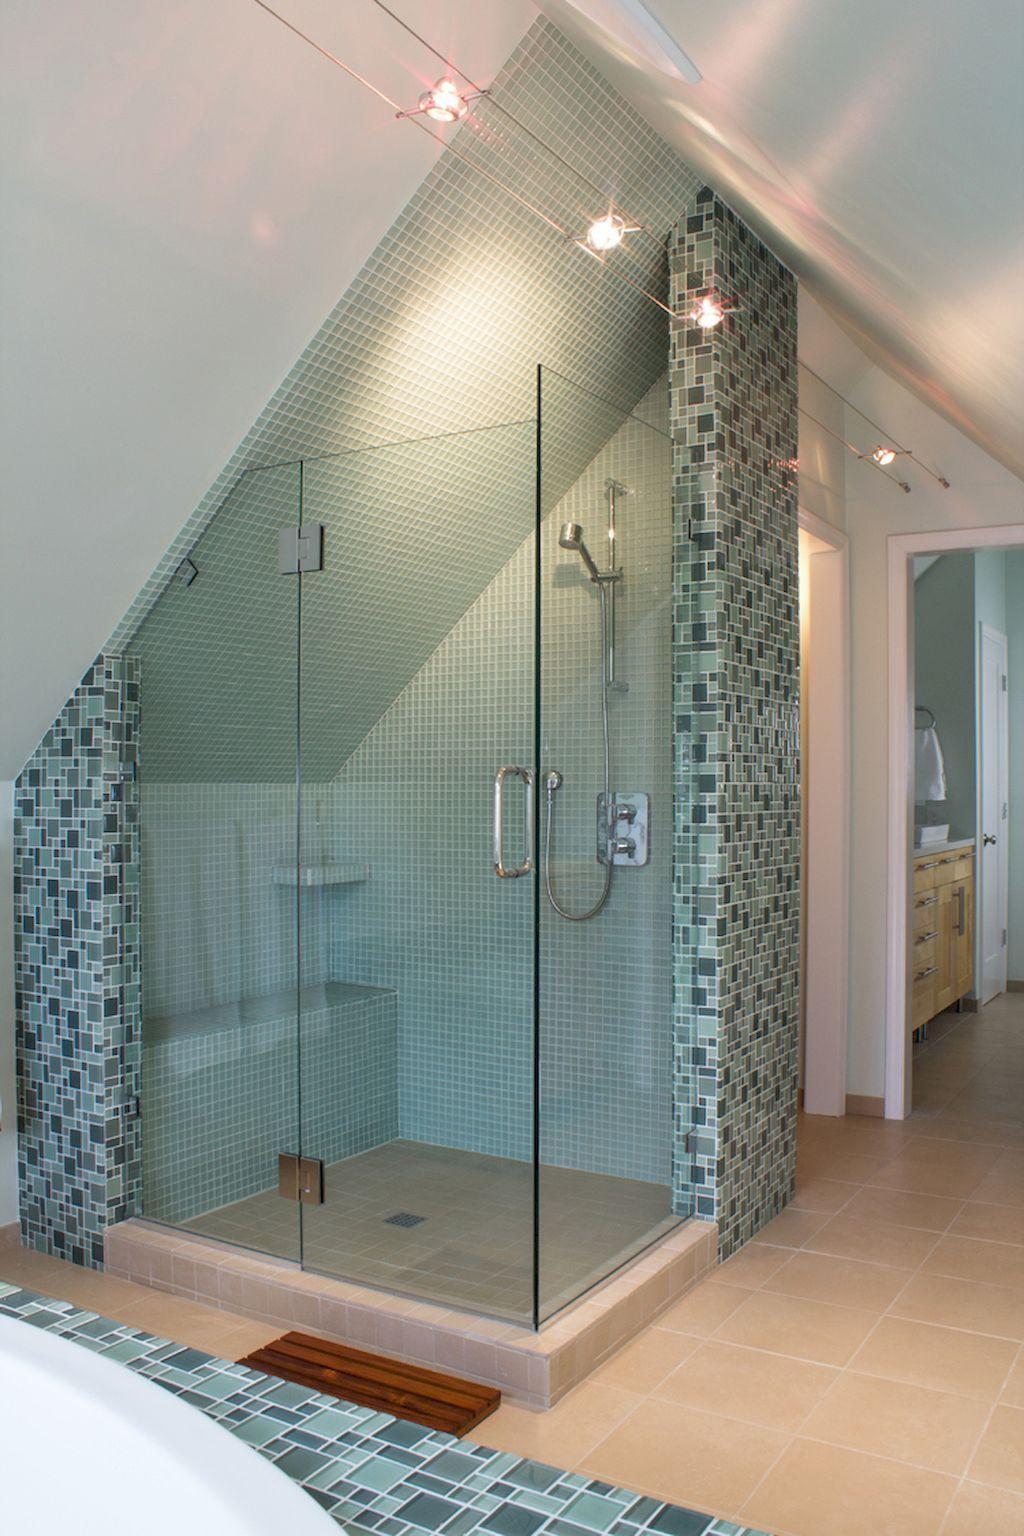 Adorable 40 Attic Bathroom Remodel Ideas ://decorapartment.com/40-attic -bathroom-remodel-ideas/ #bathroomrenovations & Adorable 40 Attic Bathroom Remodel Ideas https://decorapartment.com ...